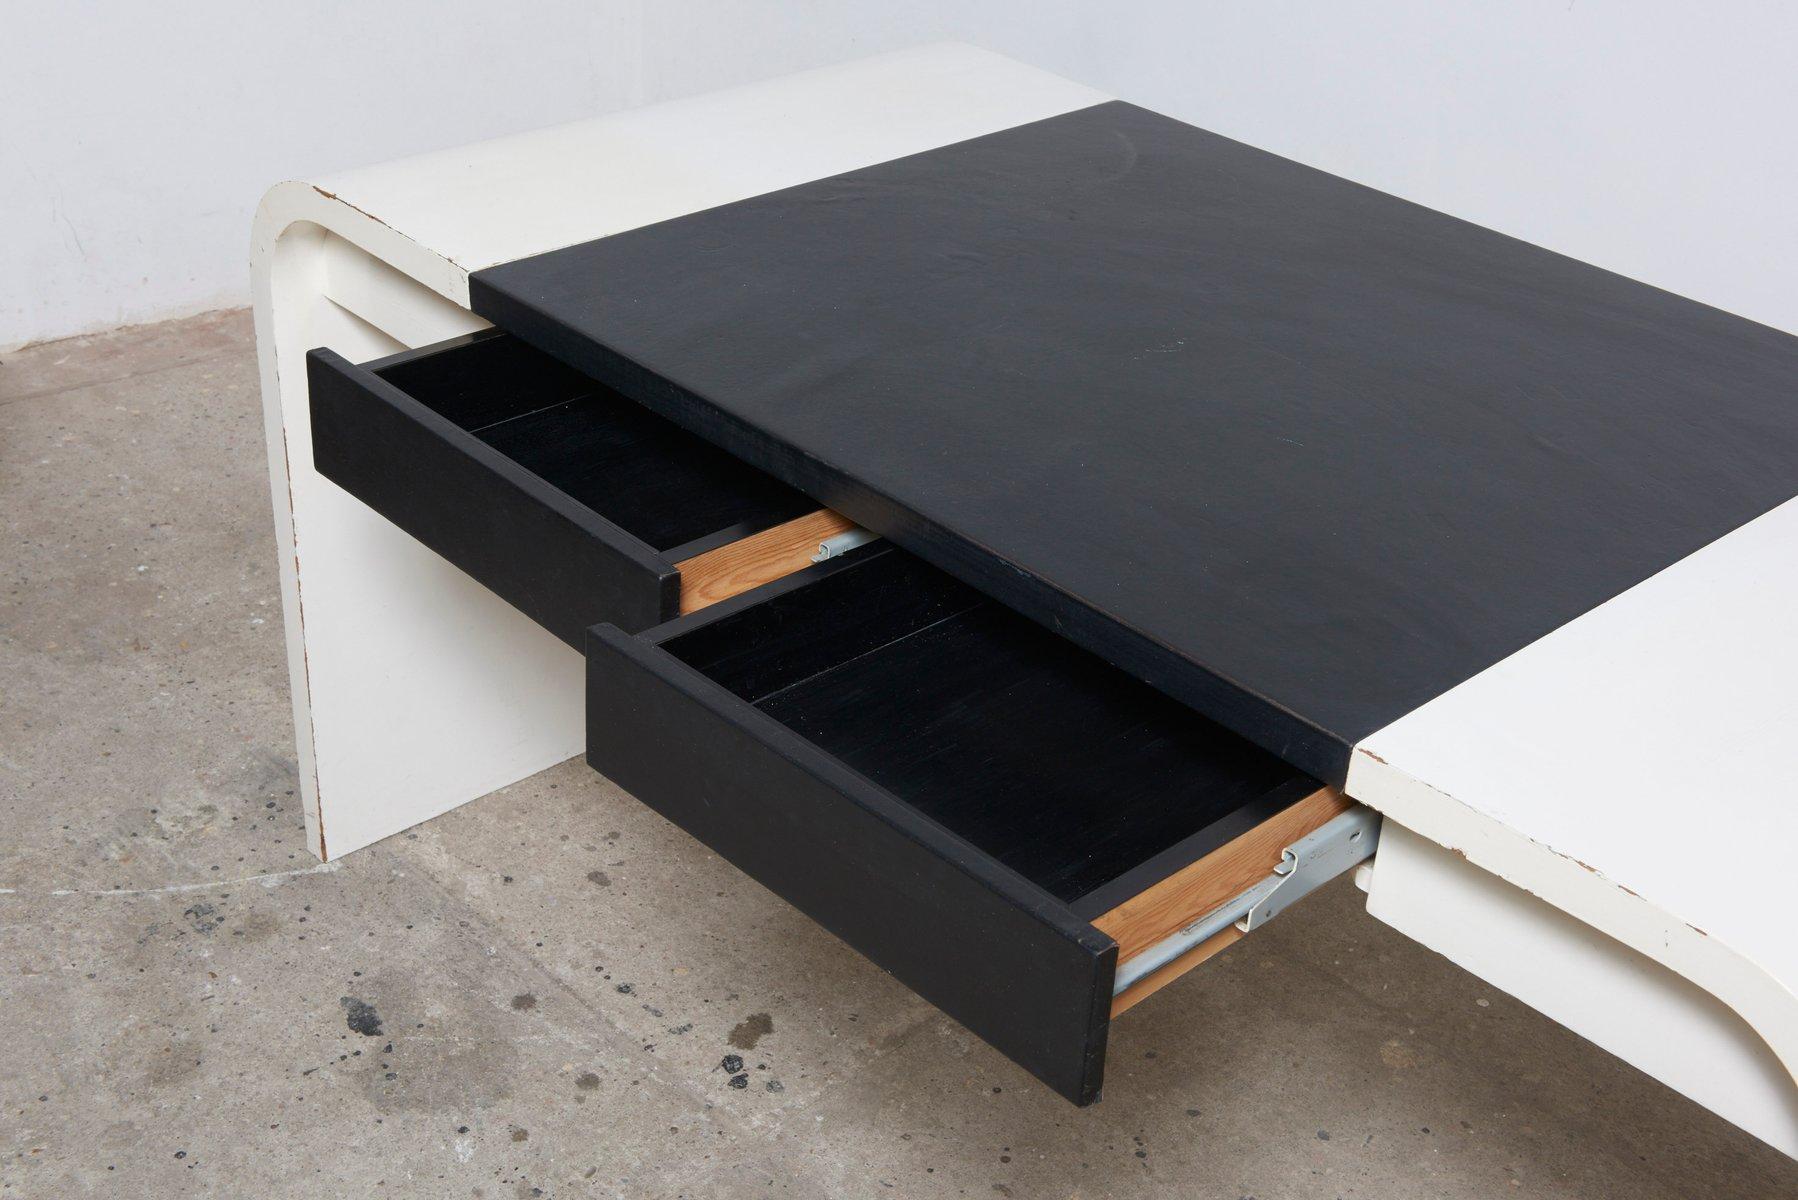 Bureau noir et blanc de de coene 1960s en vente sur pamono for Bureau noir et blanc